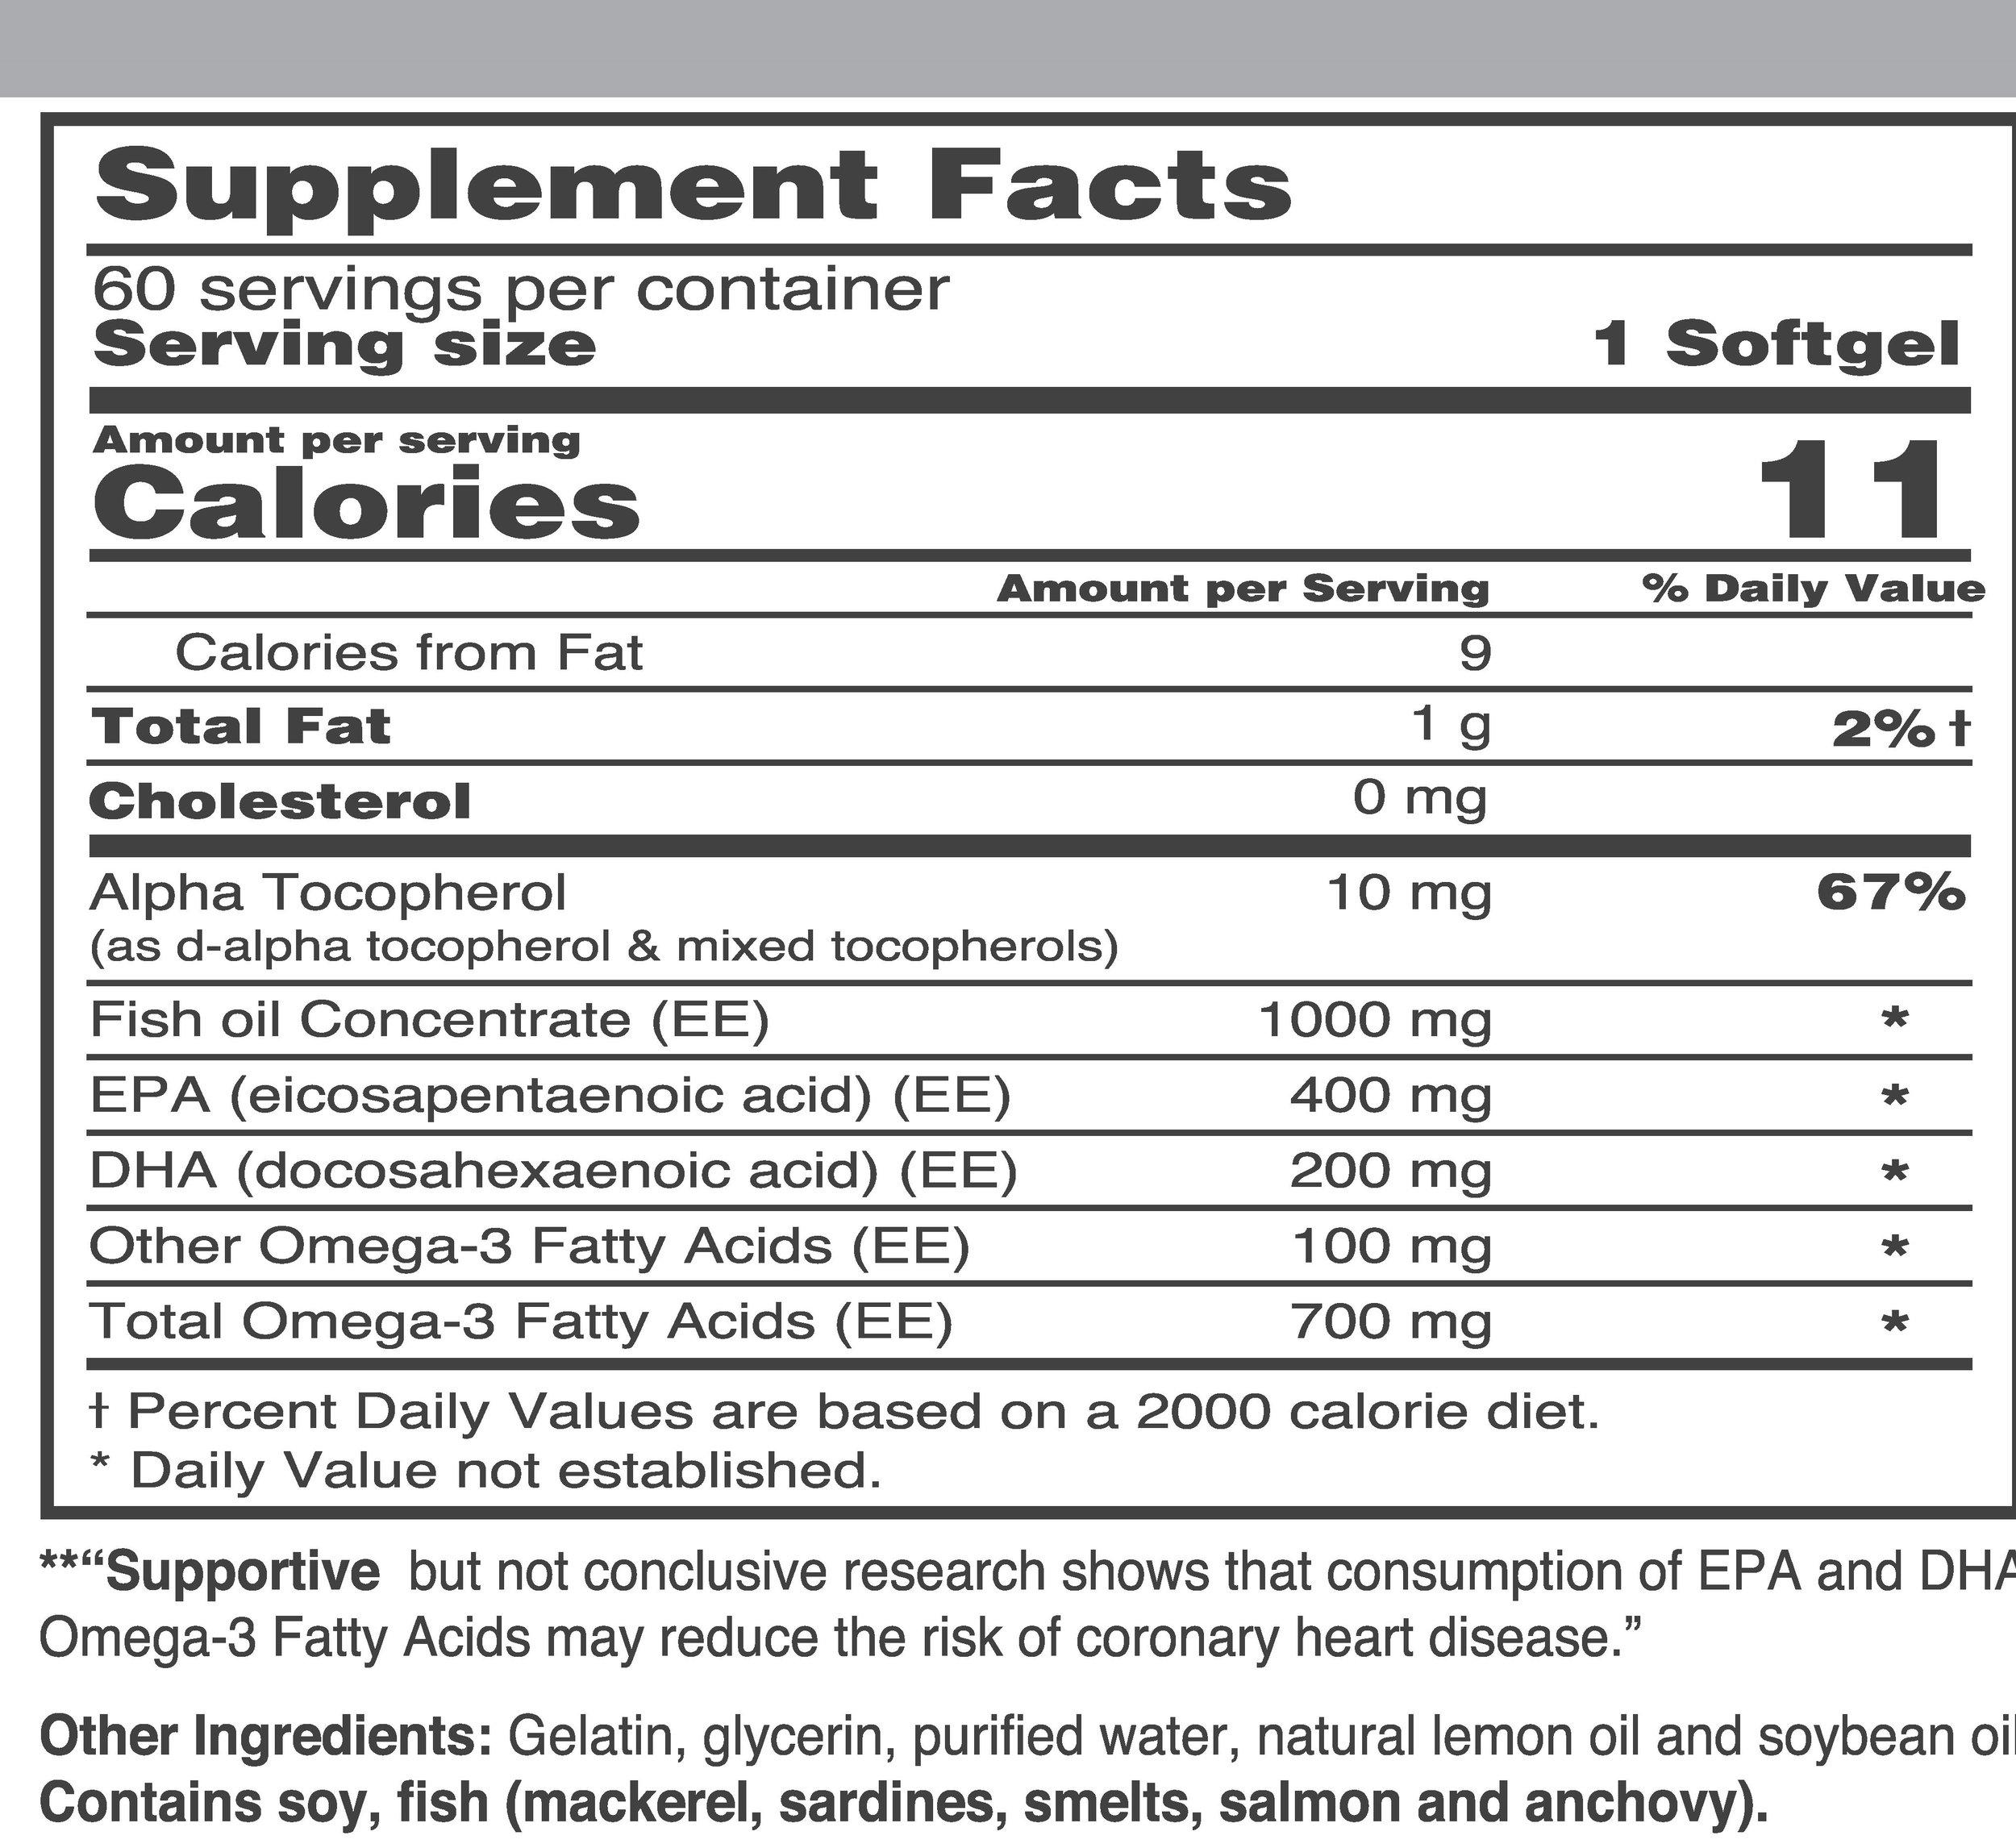 omegagelfacts.jpg